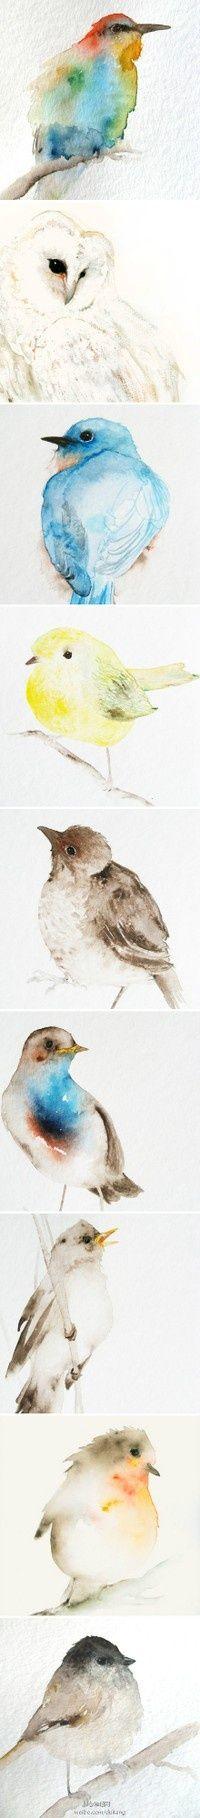 Beautiful watercolor birds! source: http://www.duitang.com/album/520420/